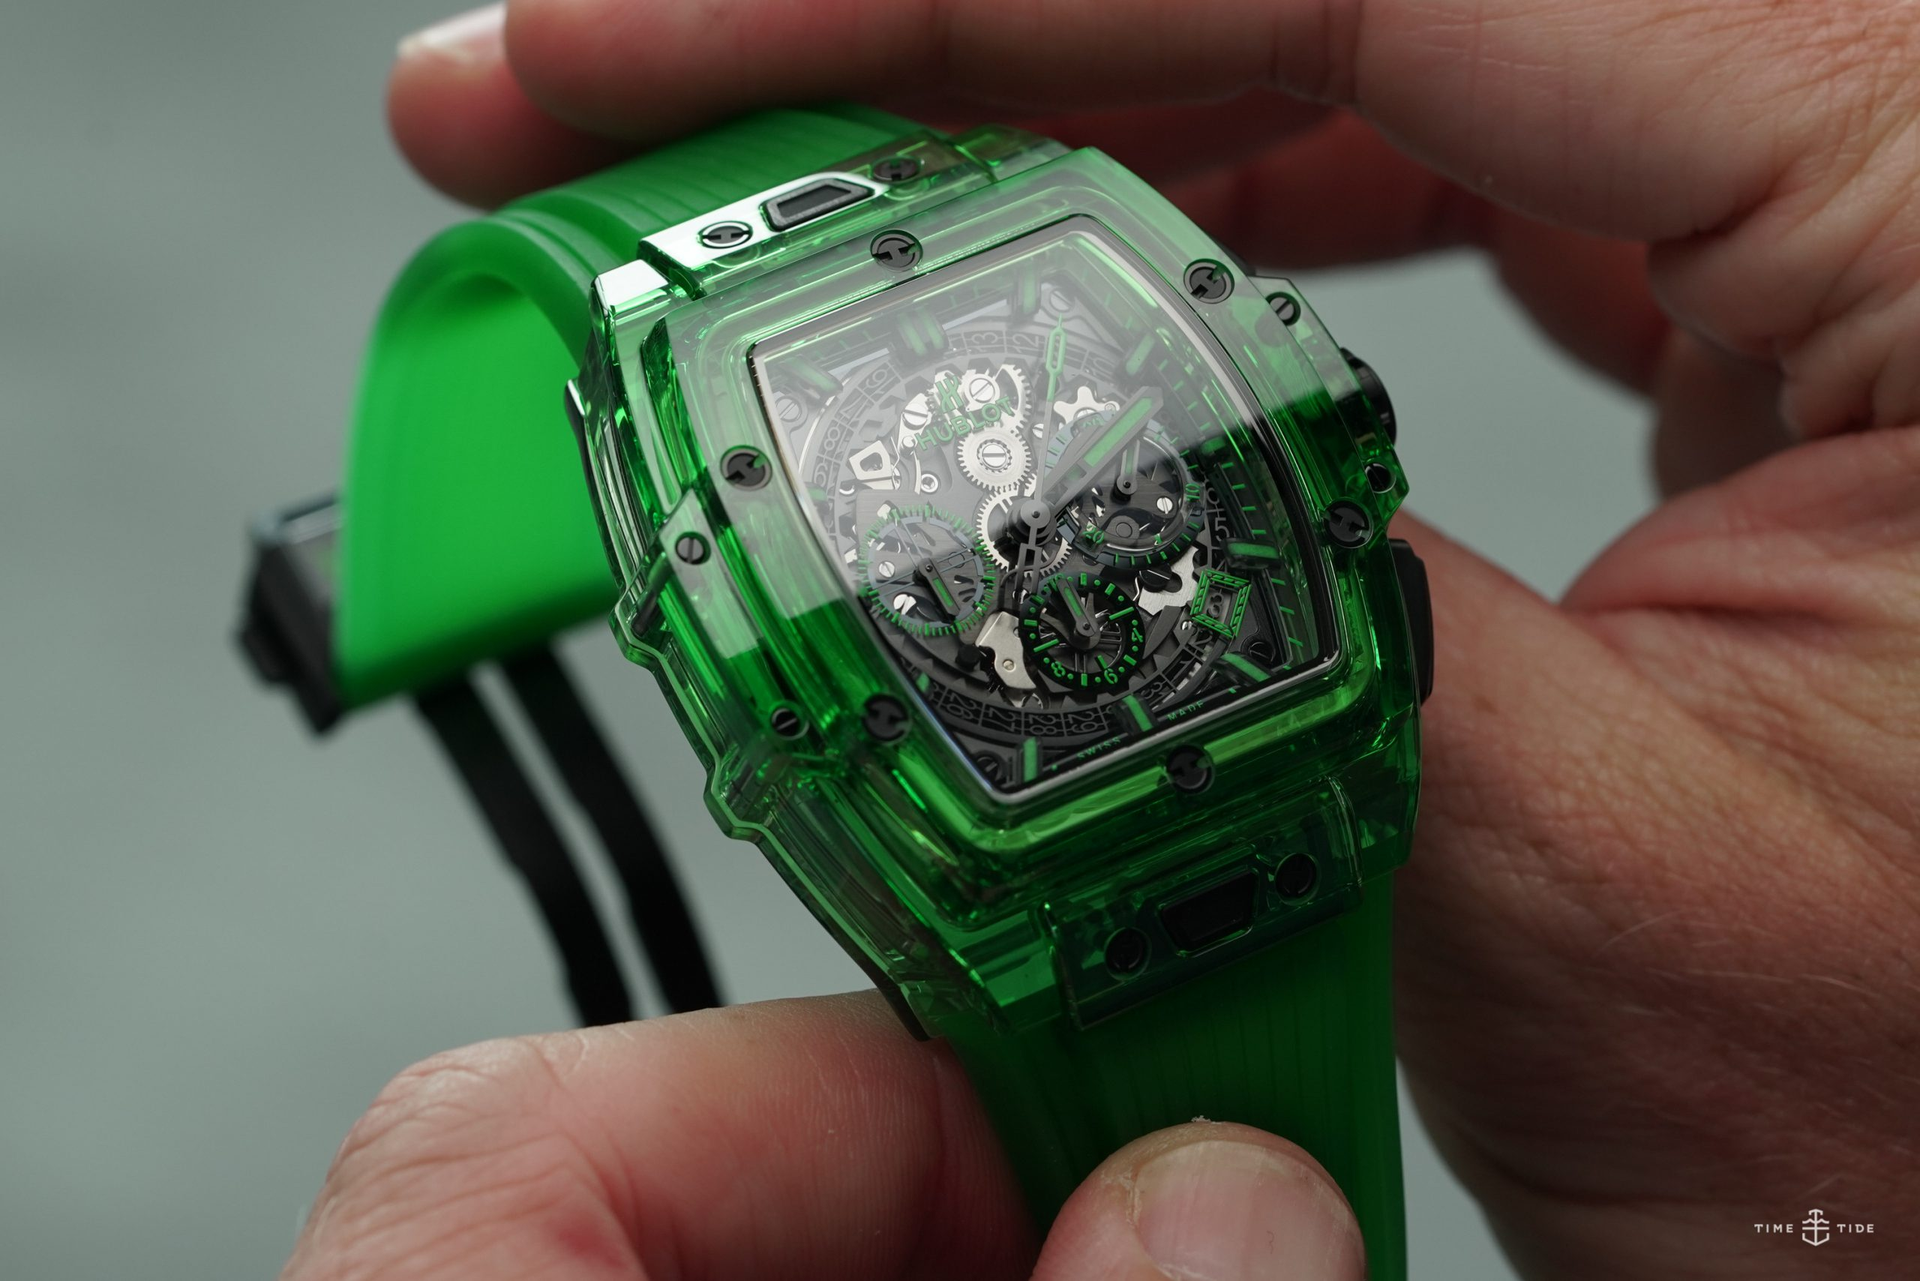 HANDS-ON: The Hublot Spirit of Big Bang Green Saxem